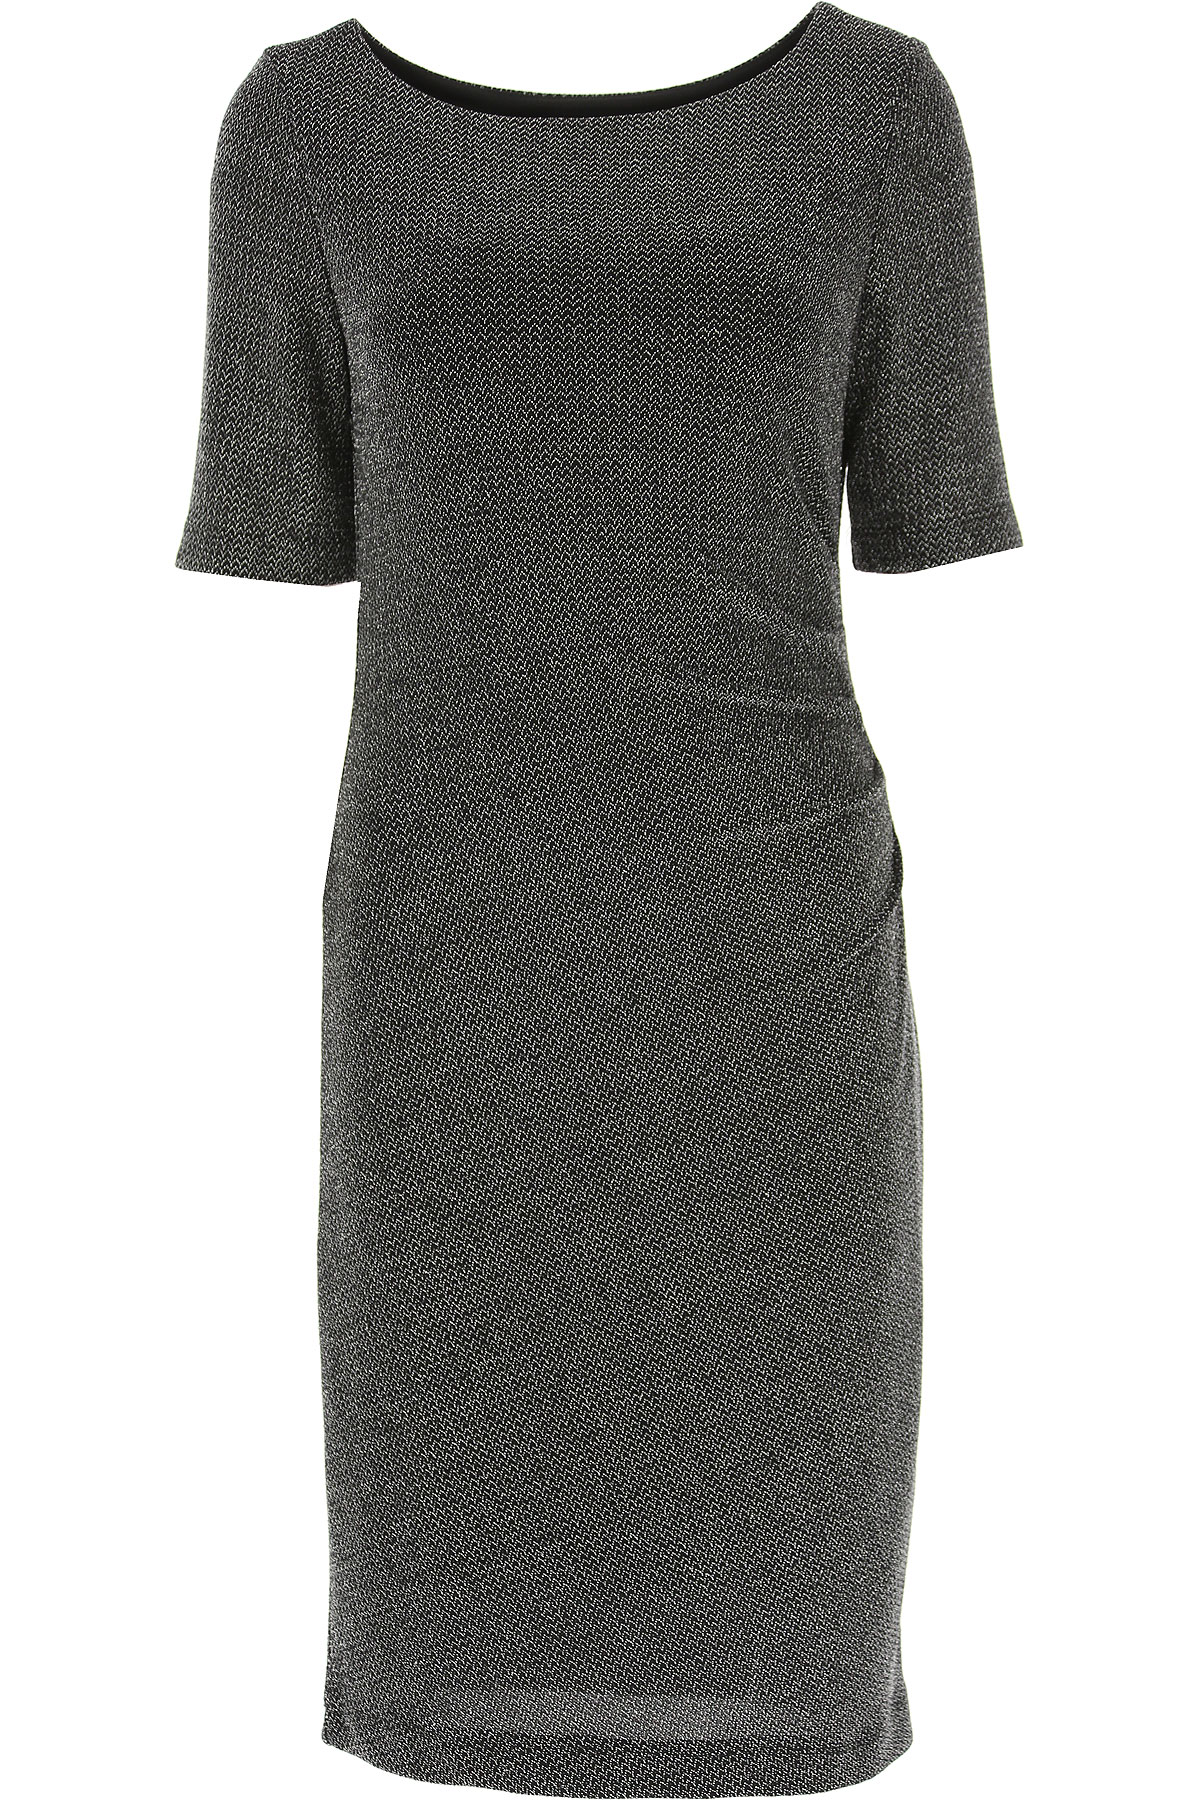 Image of Joseph Ribkoff Dress for Women, Evening Cocktail Party, Black, Nylon, 2017, 10 6 8